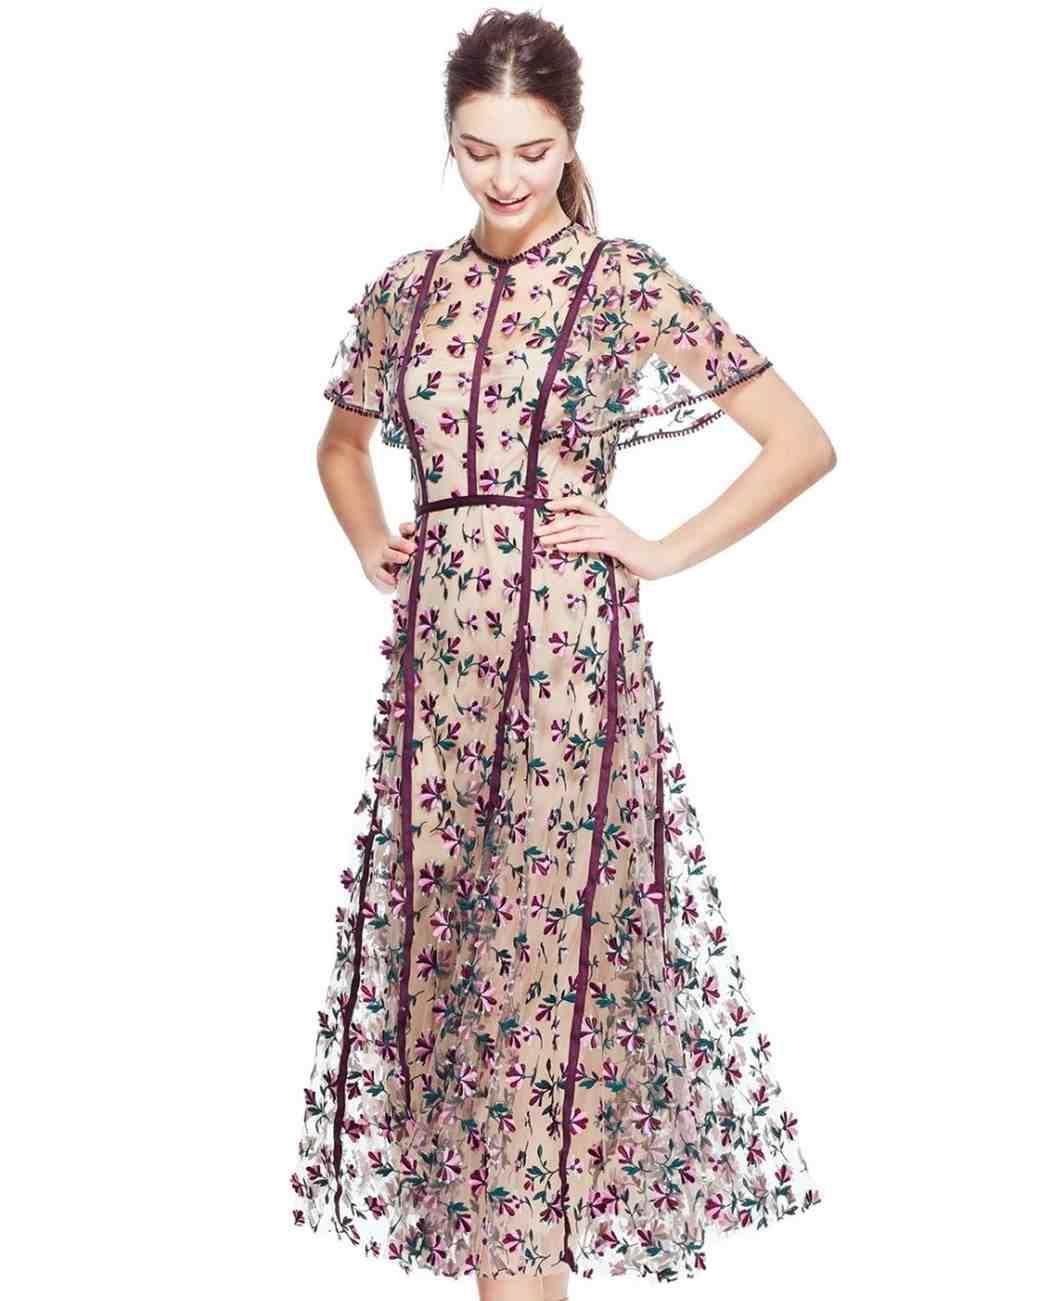 Lela Rose Floral Engagement Party Dress